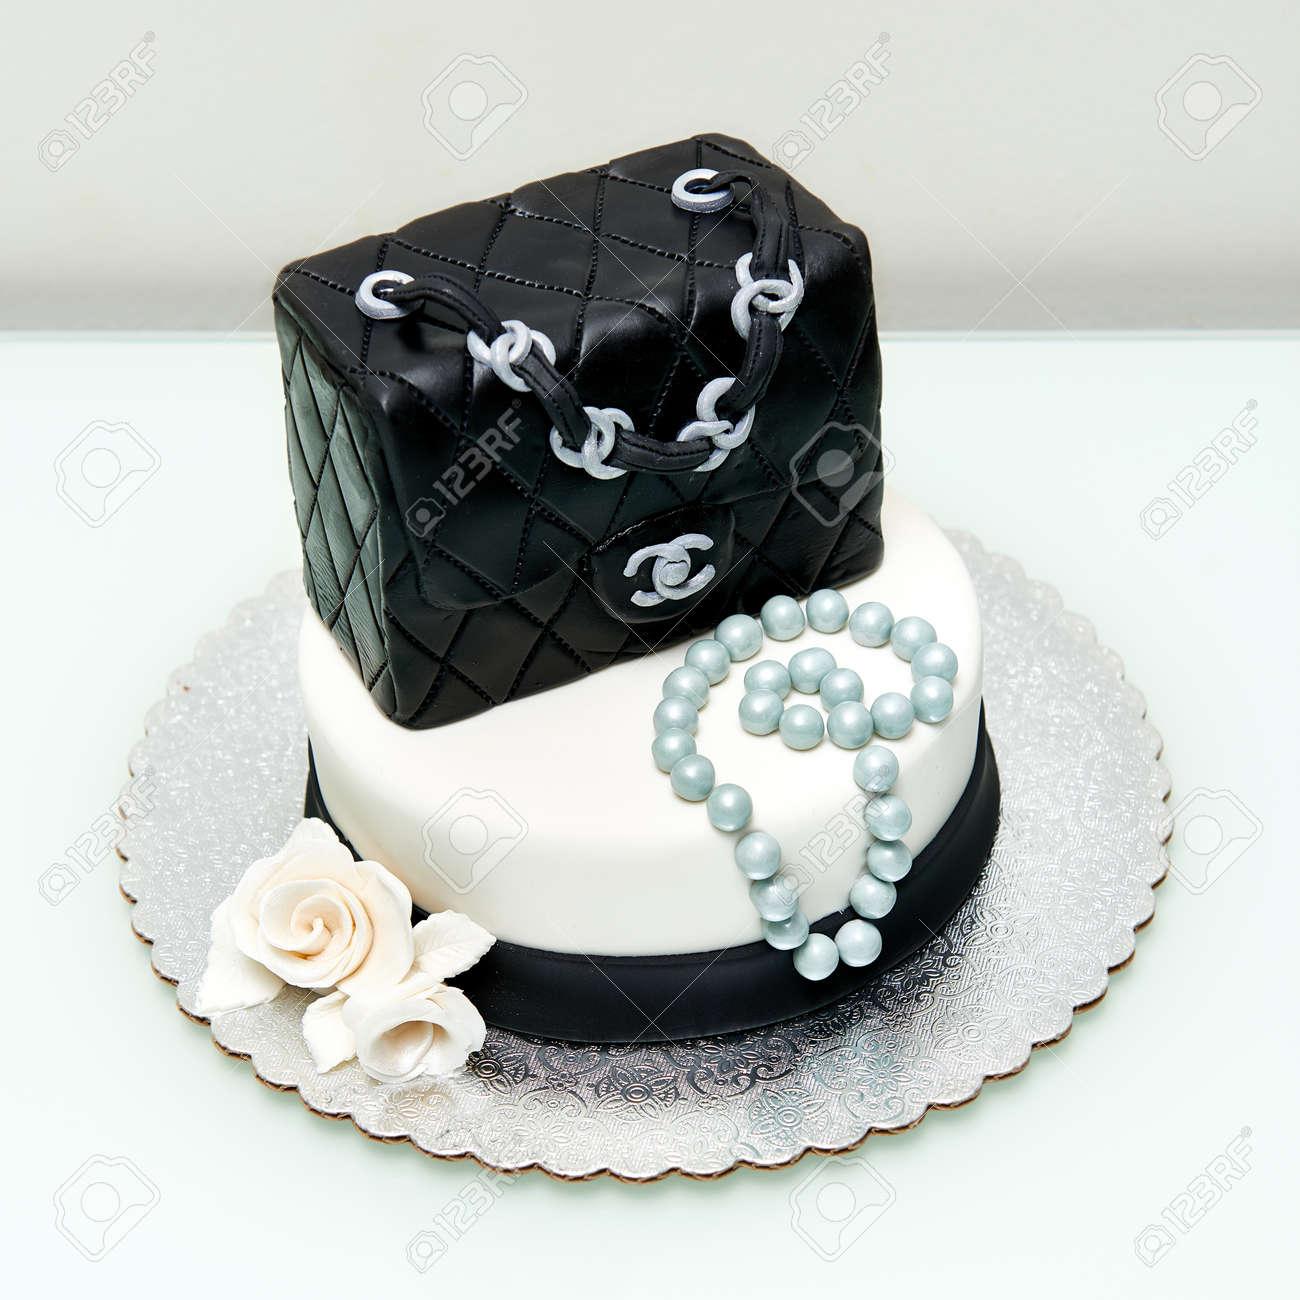 Homemade classic Chanel handbag in black fountain birthday cake. Stock  Photo - 72051286 b7e1a6e0ef9e5